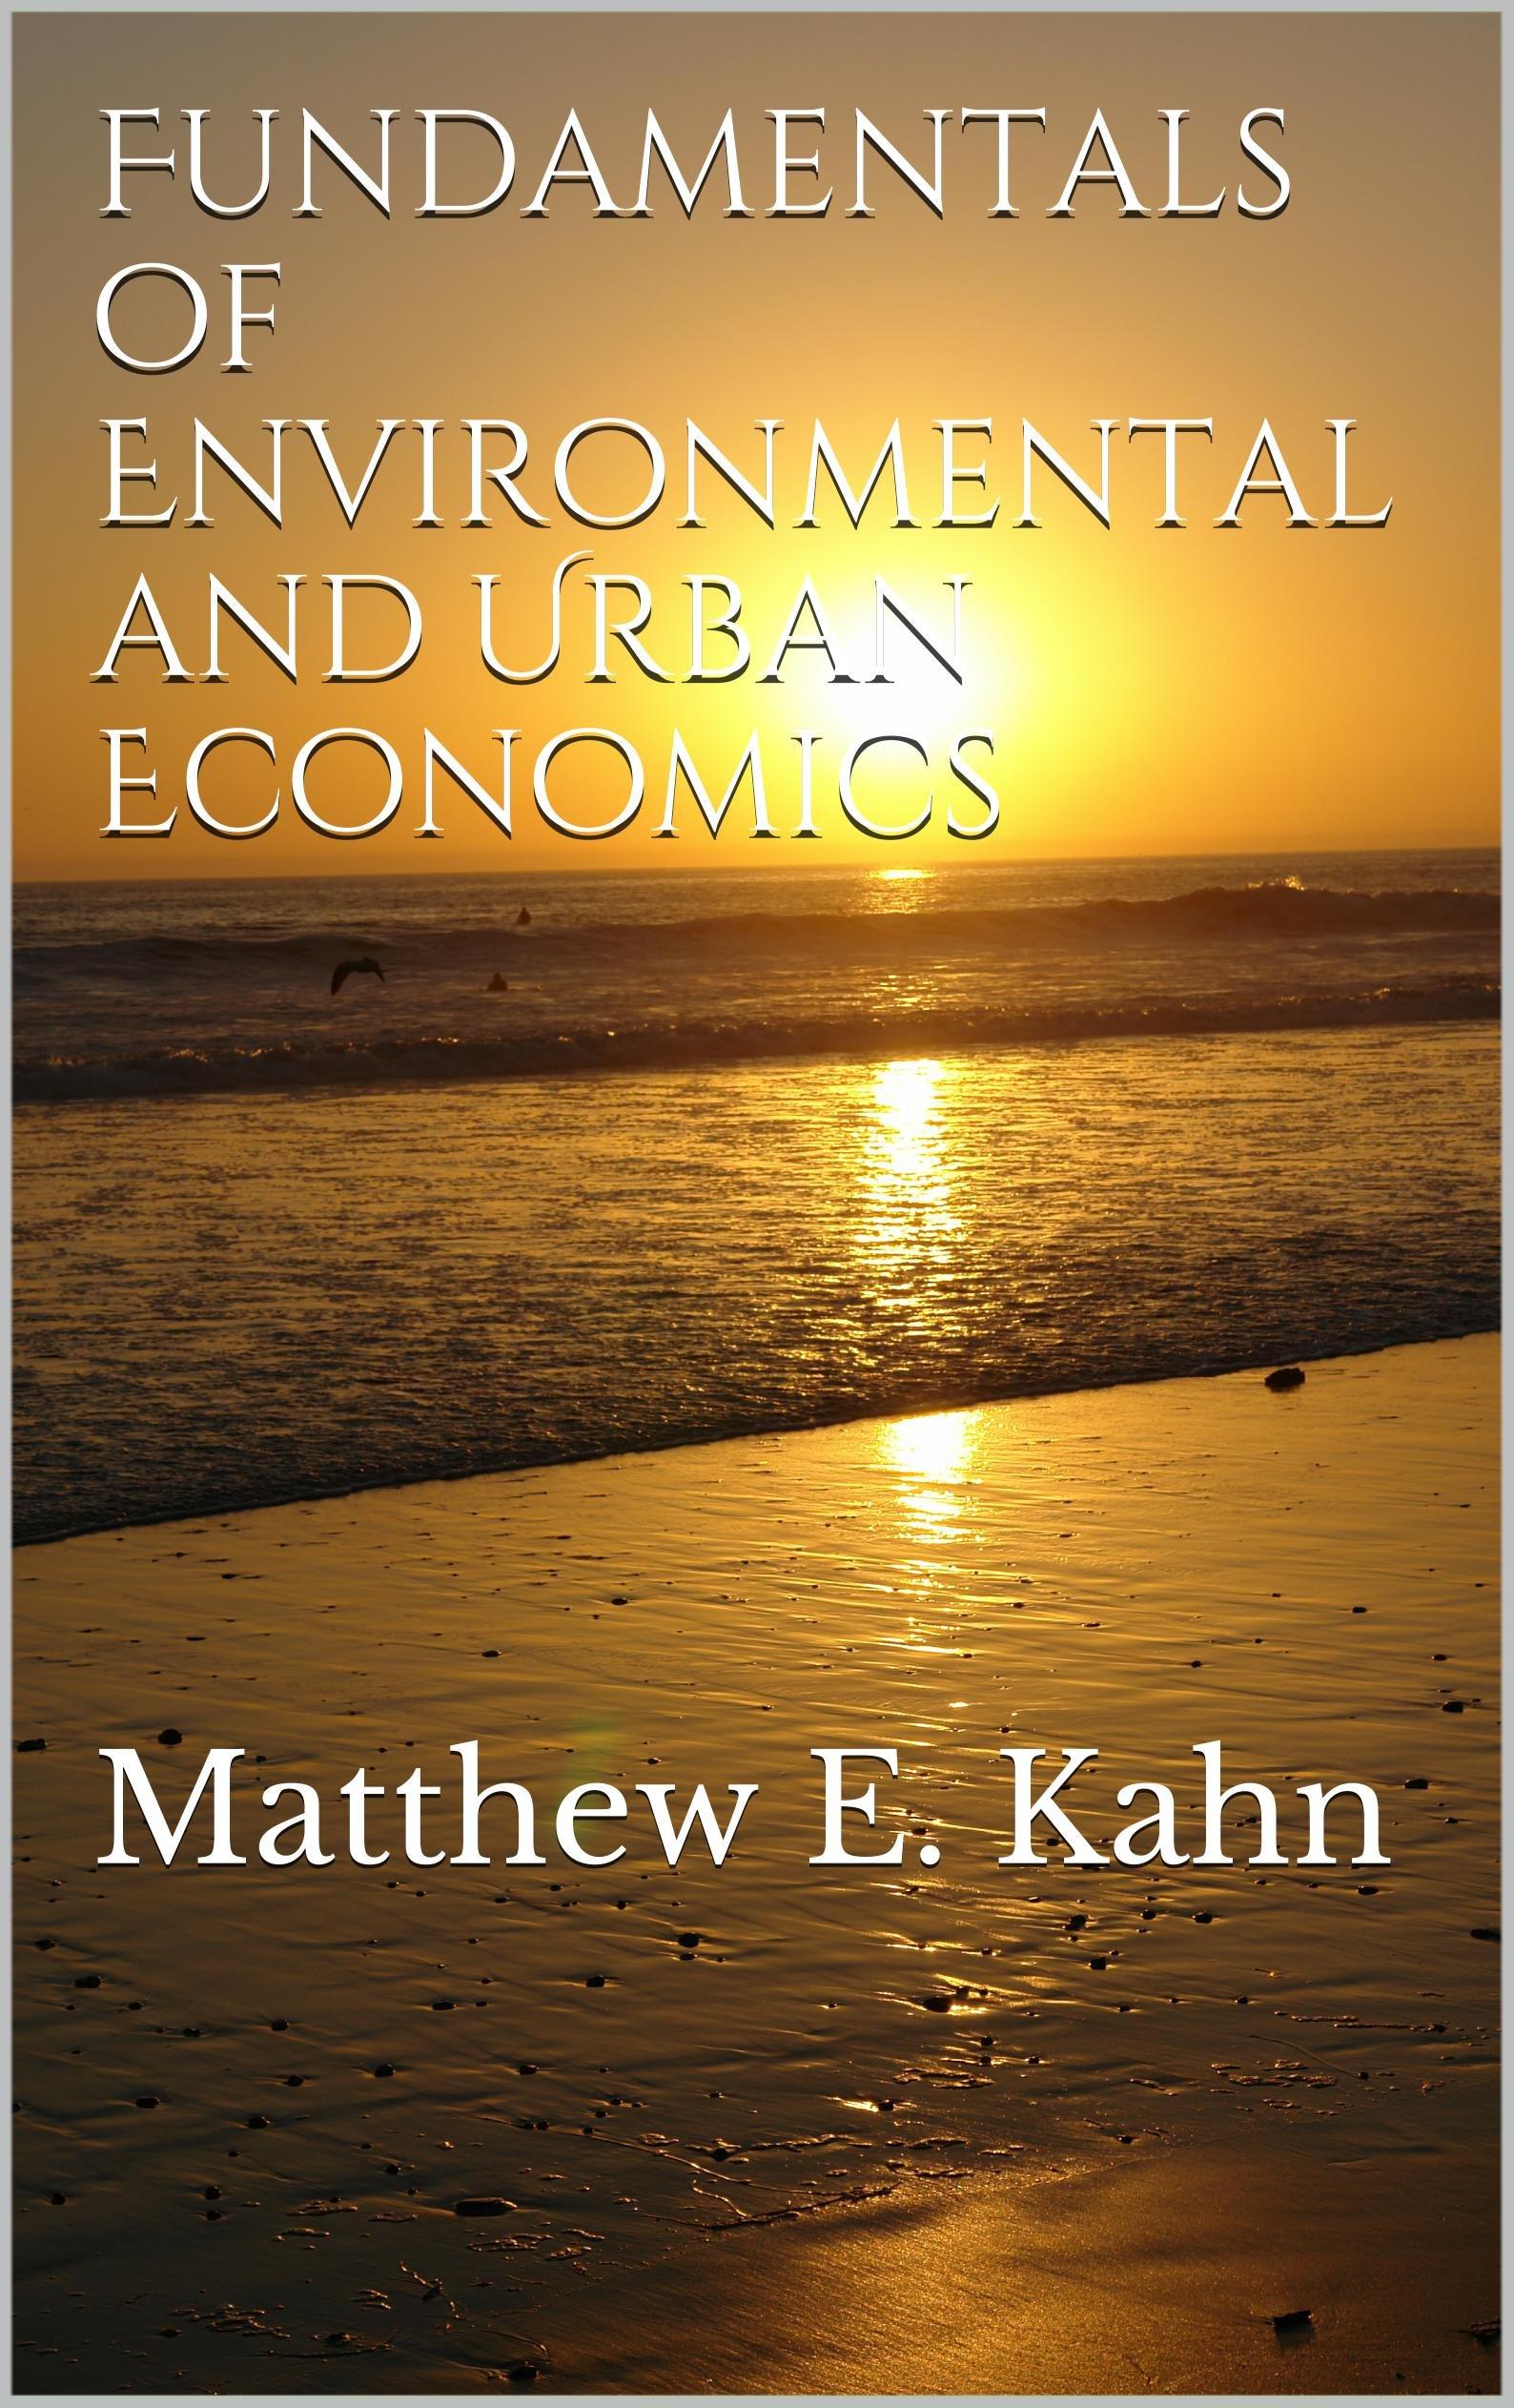 Fundamentals of Environmental and Urban Economics: Matthew E. Kahn